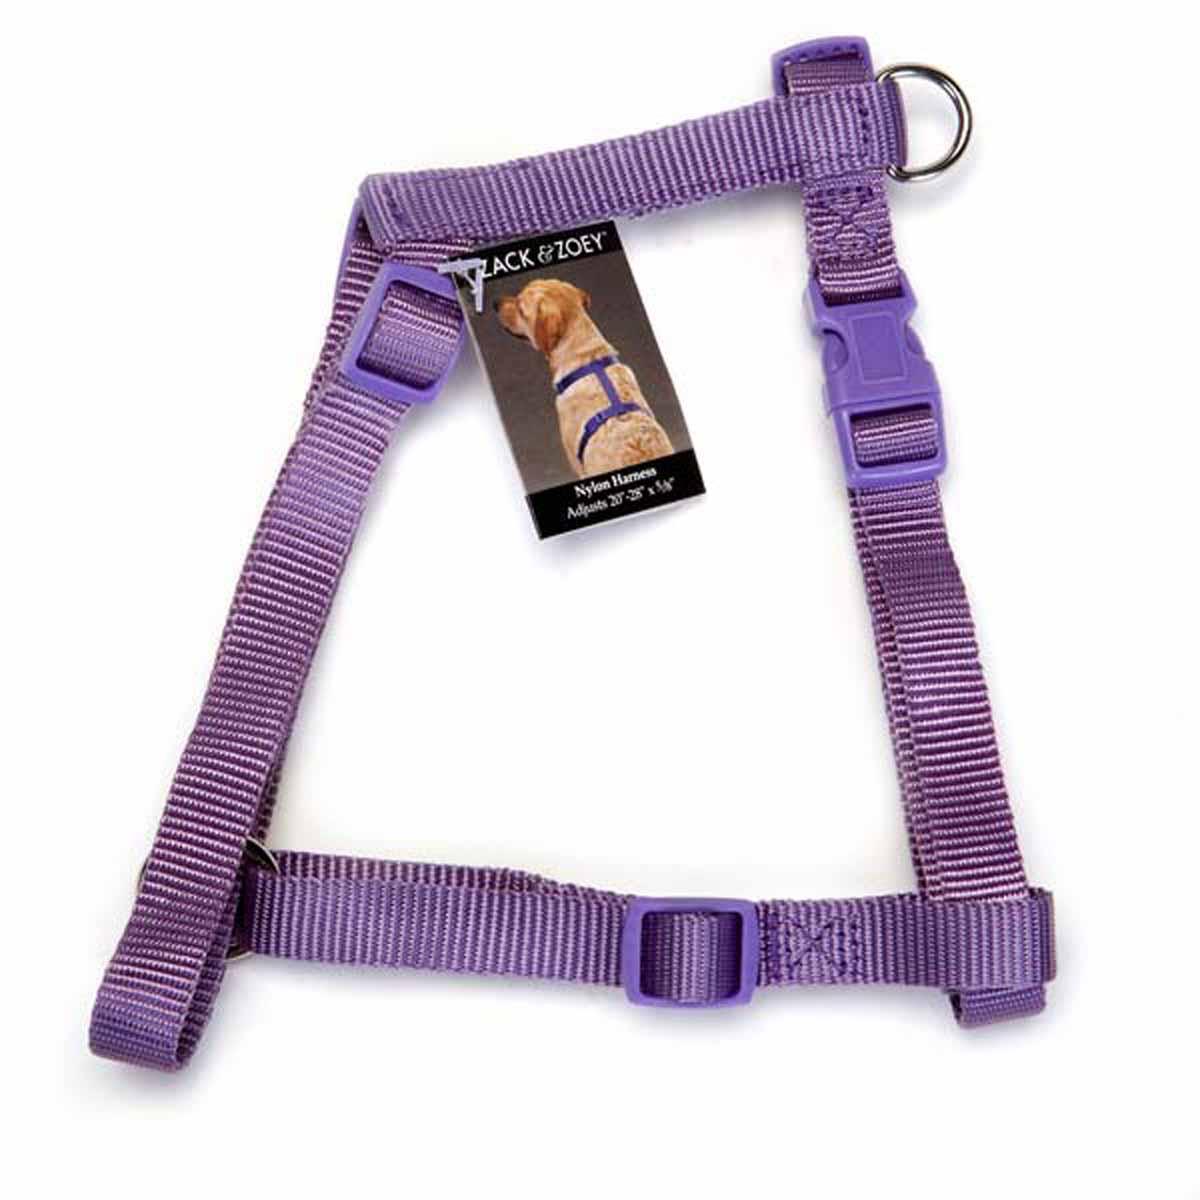 Nylon Dog Harness by Zack & Zoey - Light Plum